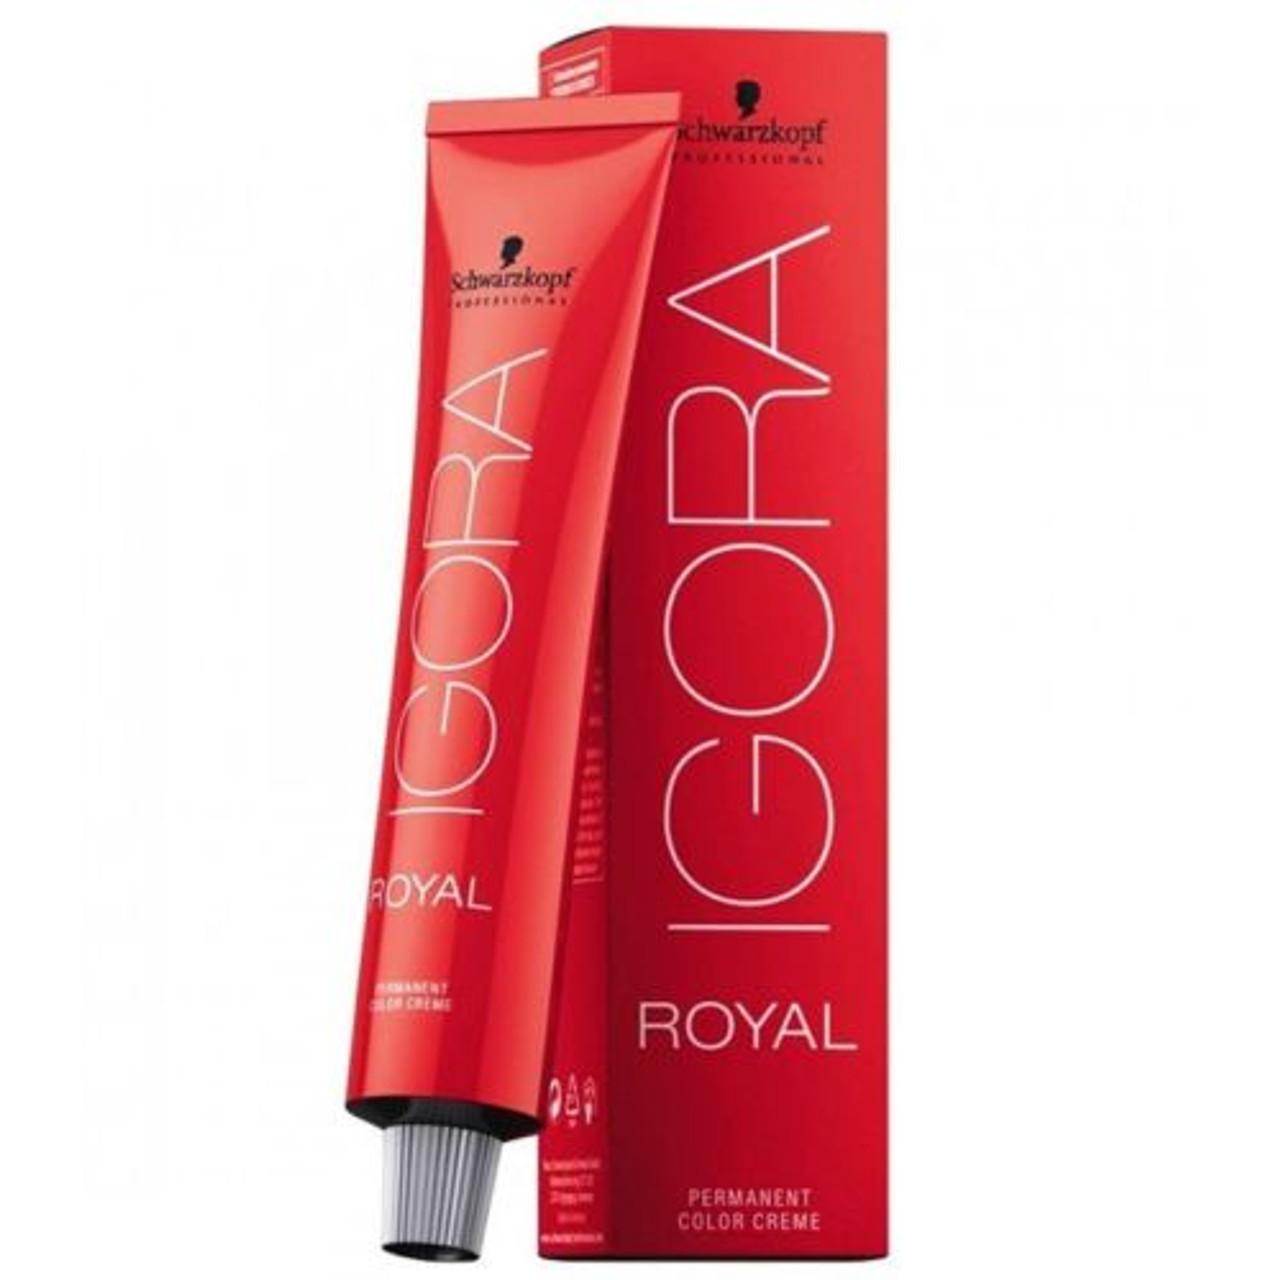 Schwarzkopf Igora Royal Permanent Color Creme - 8-65 Light Auburn Brown